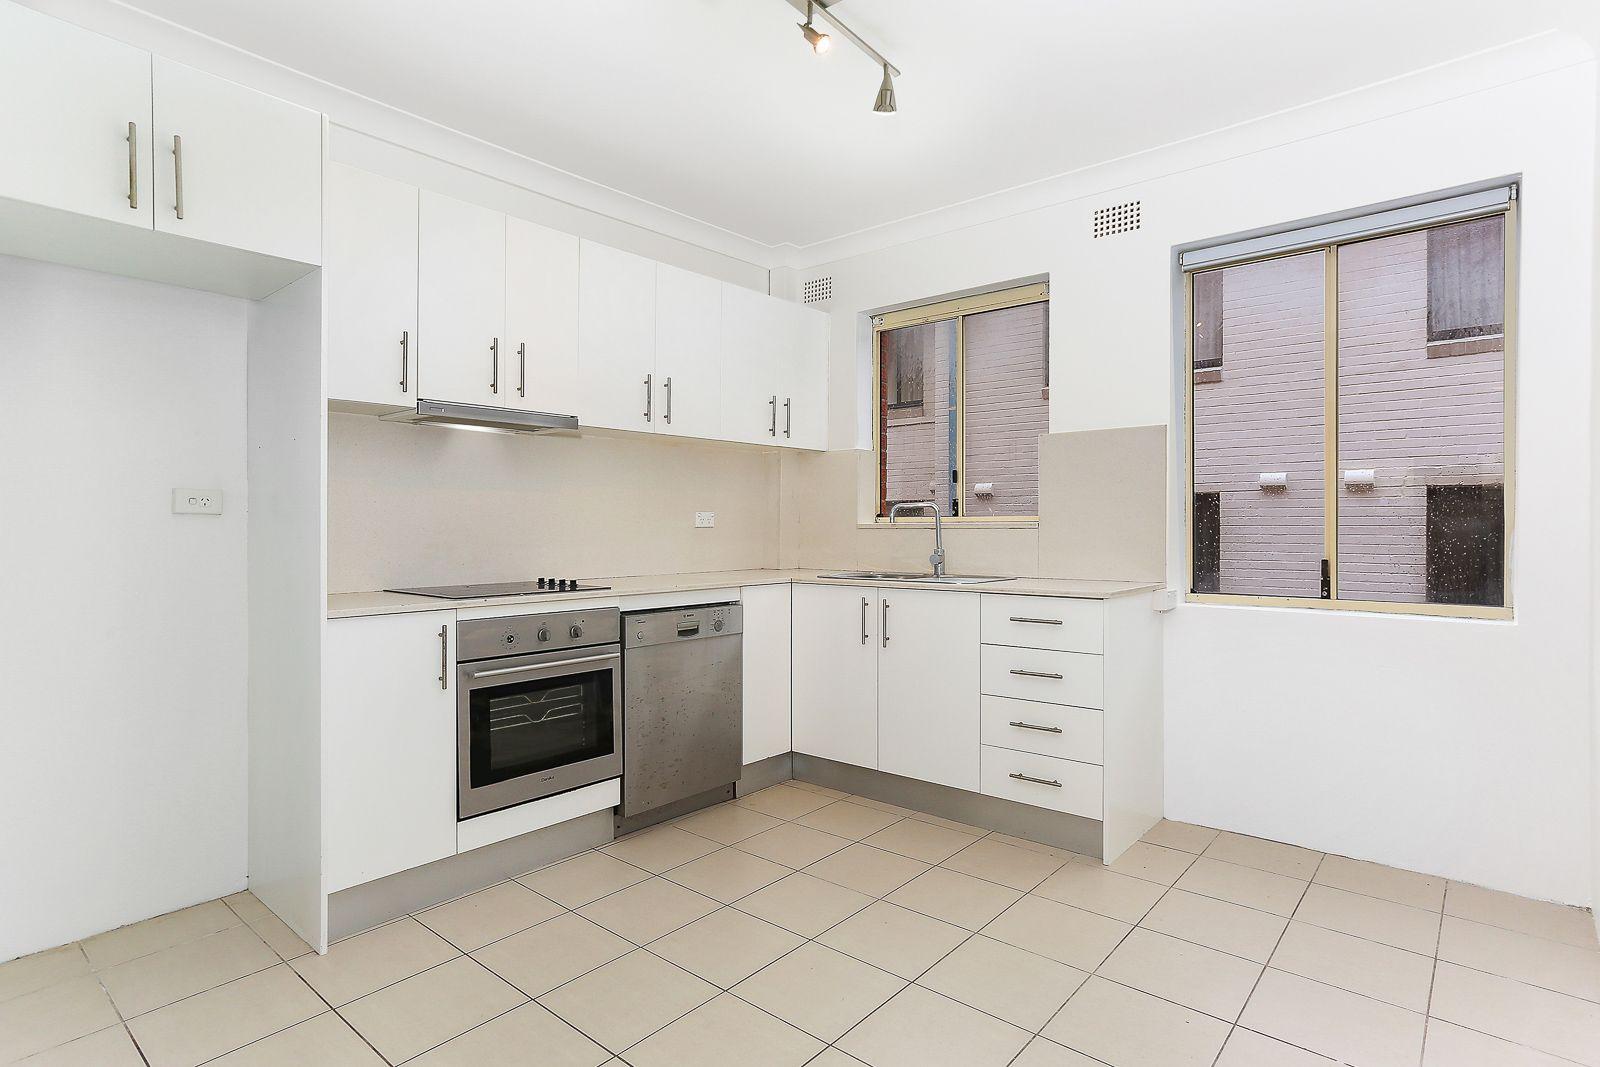 2/8 Beaumond Avenue, Maroubra NSW 2035, Image 0